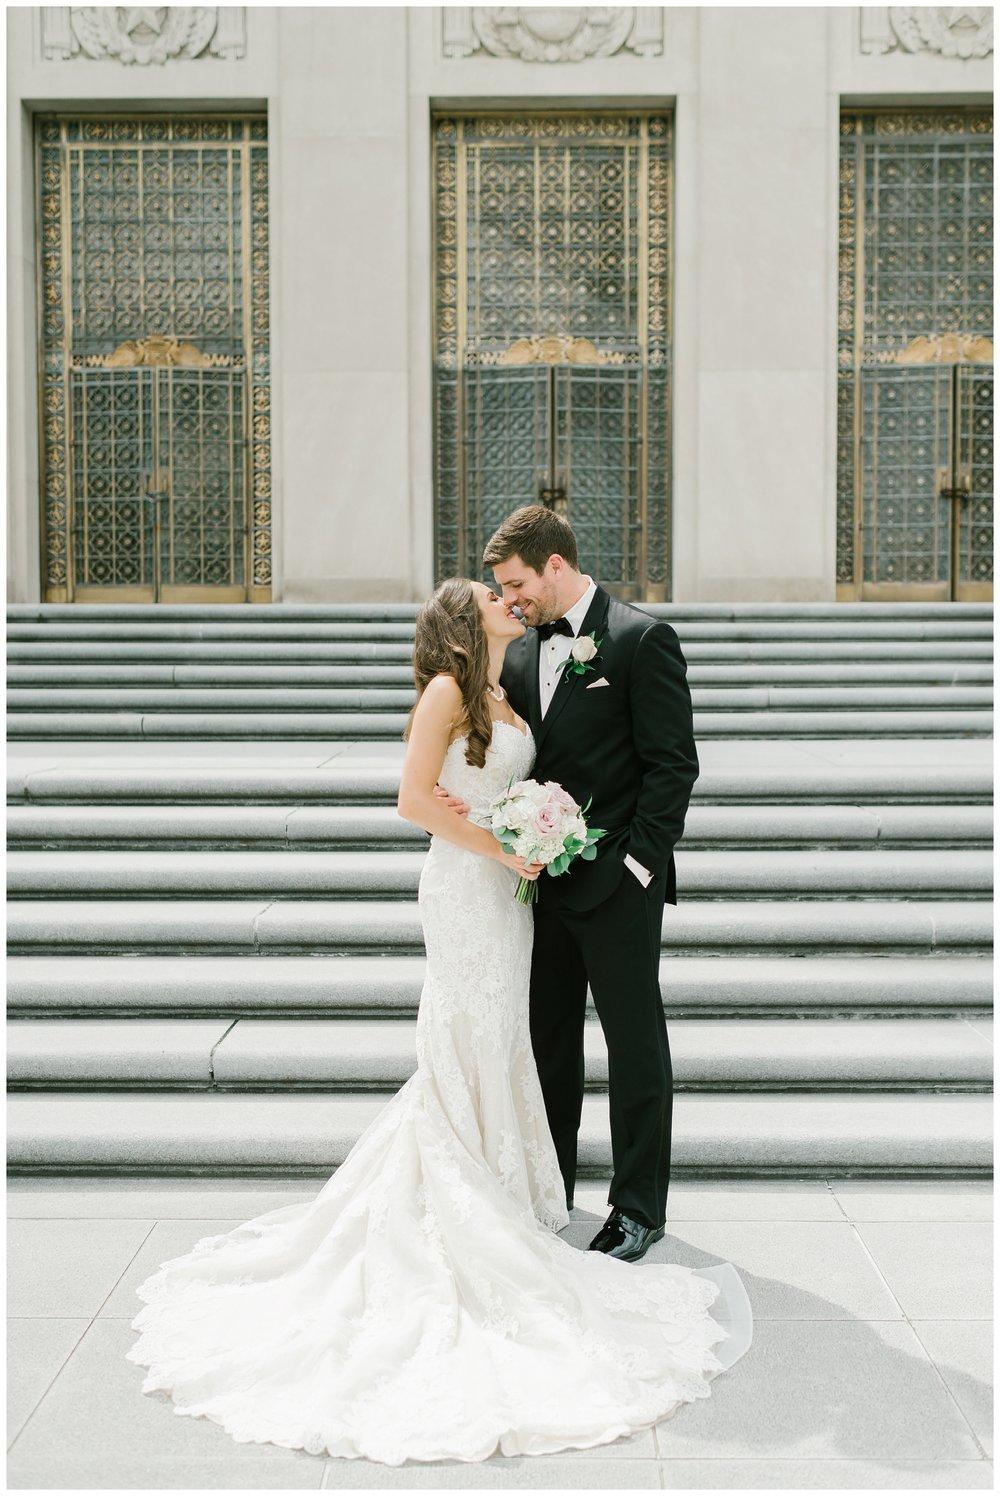 Rebecca_Bridges_Photography_Indianapolis_Wedding_Photographer_6825.jpg